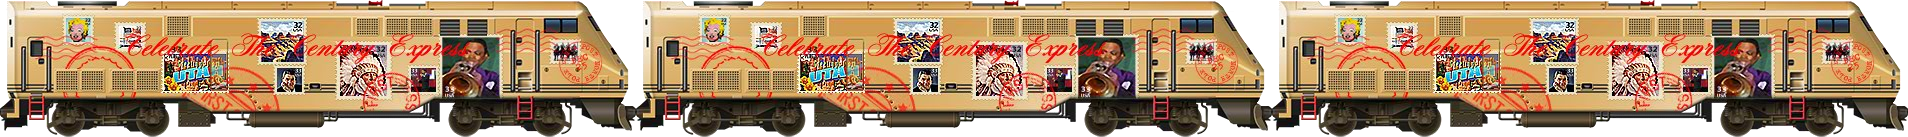 Century Express II